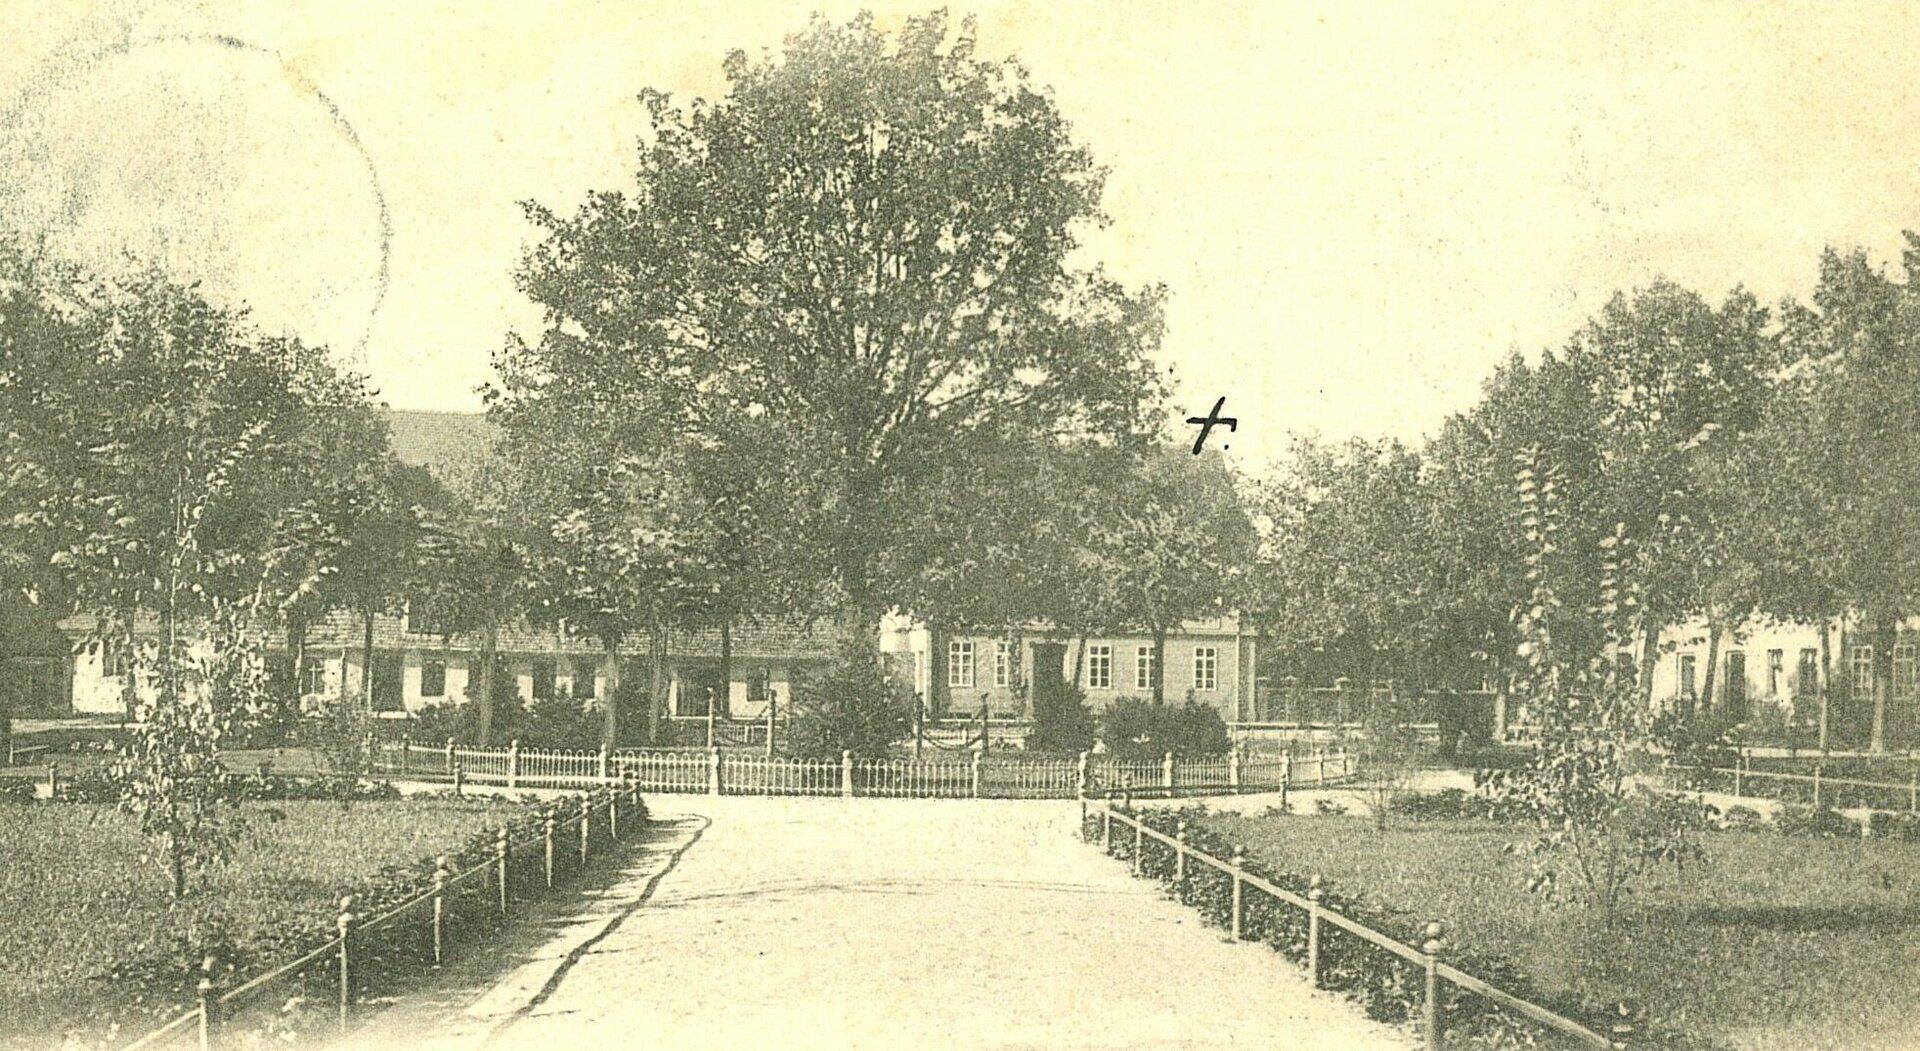 Foto: Stadtarchiv | Grahlplatz ohne Ulanendenkmal um 1900